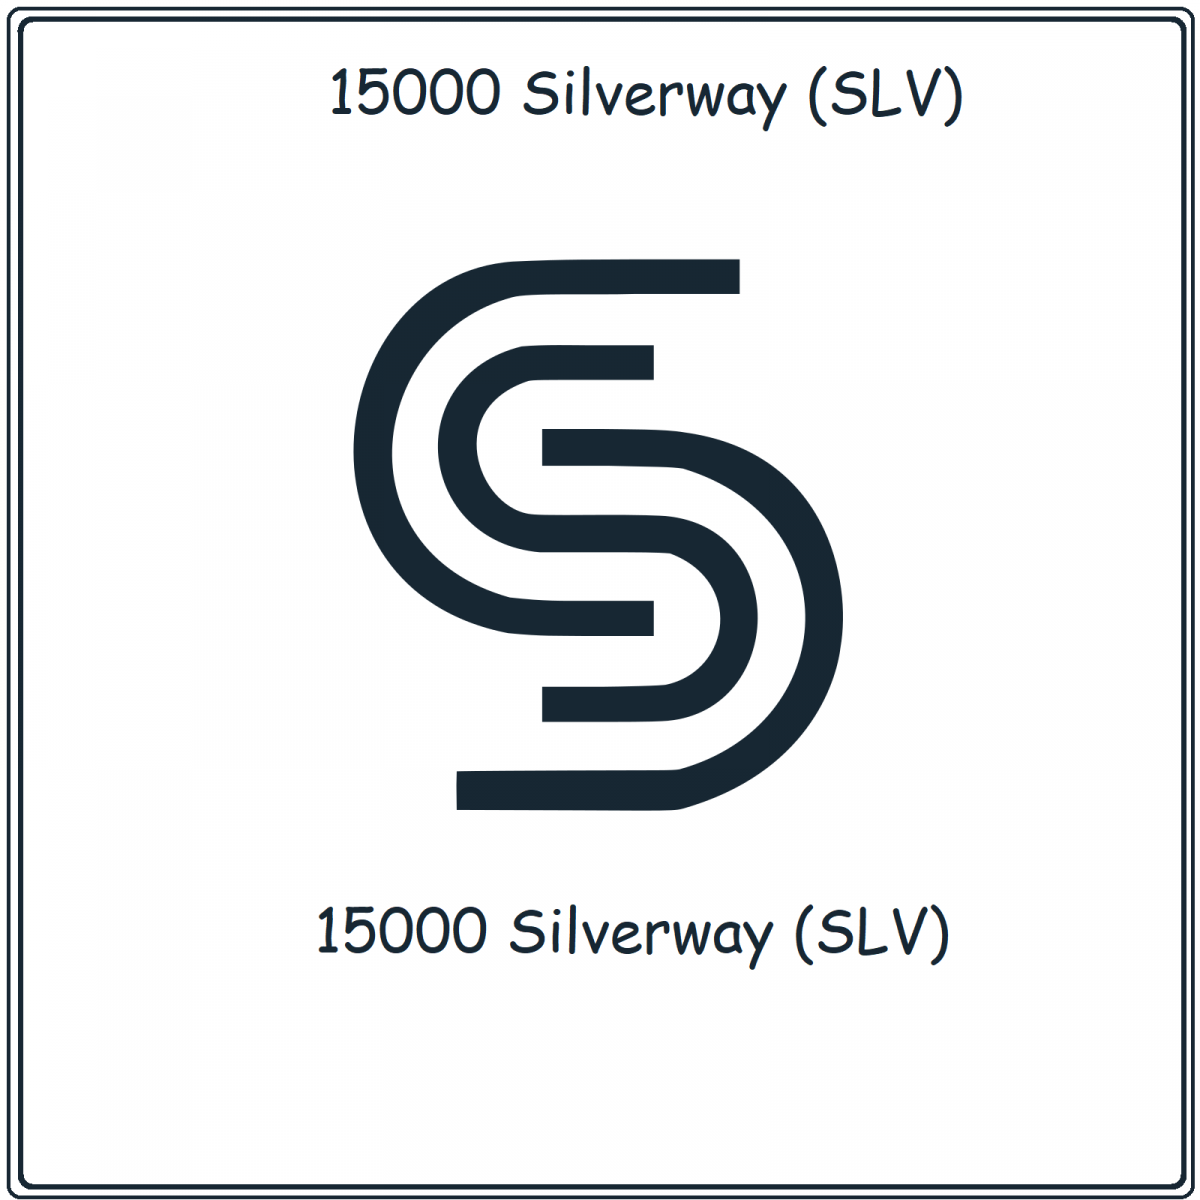 15000 Silverway SLV Token Contract